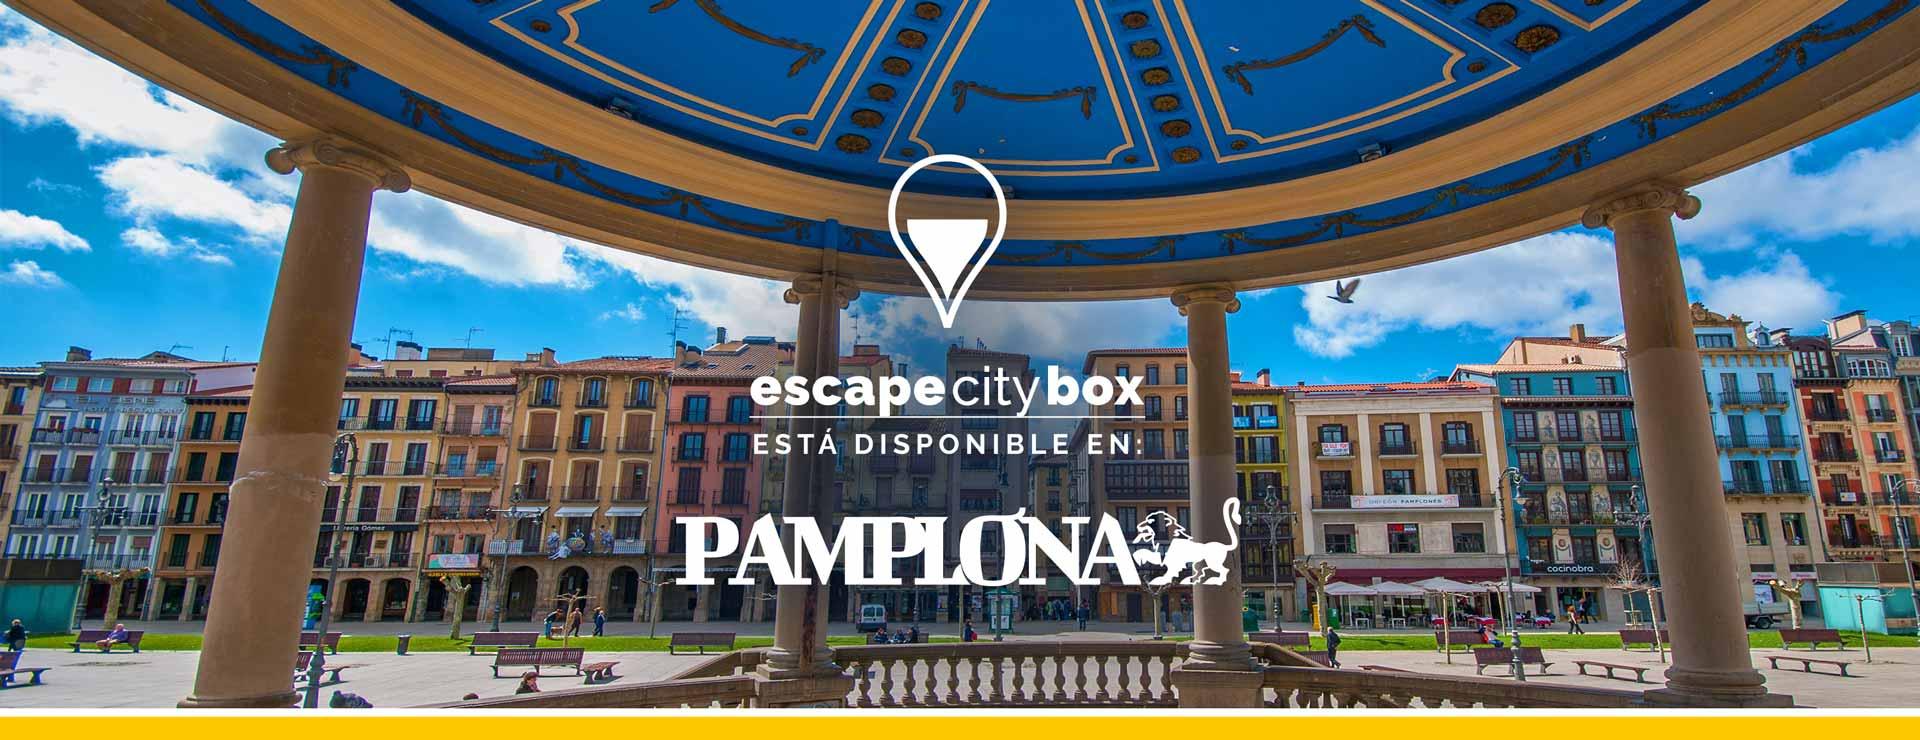 City Escape en Pamplona